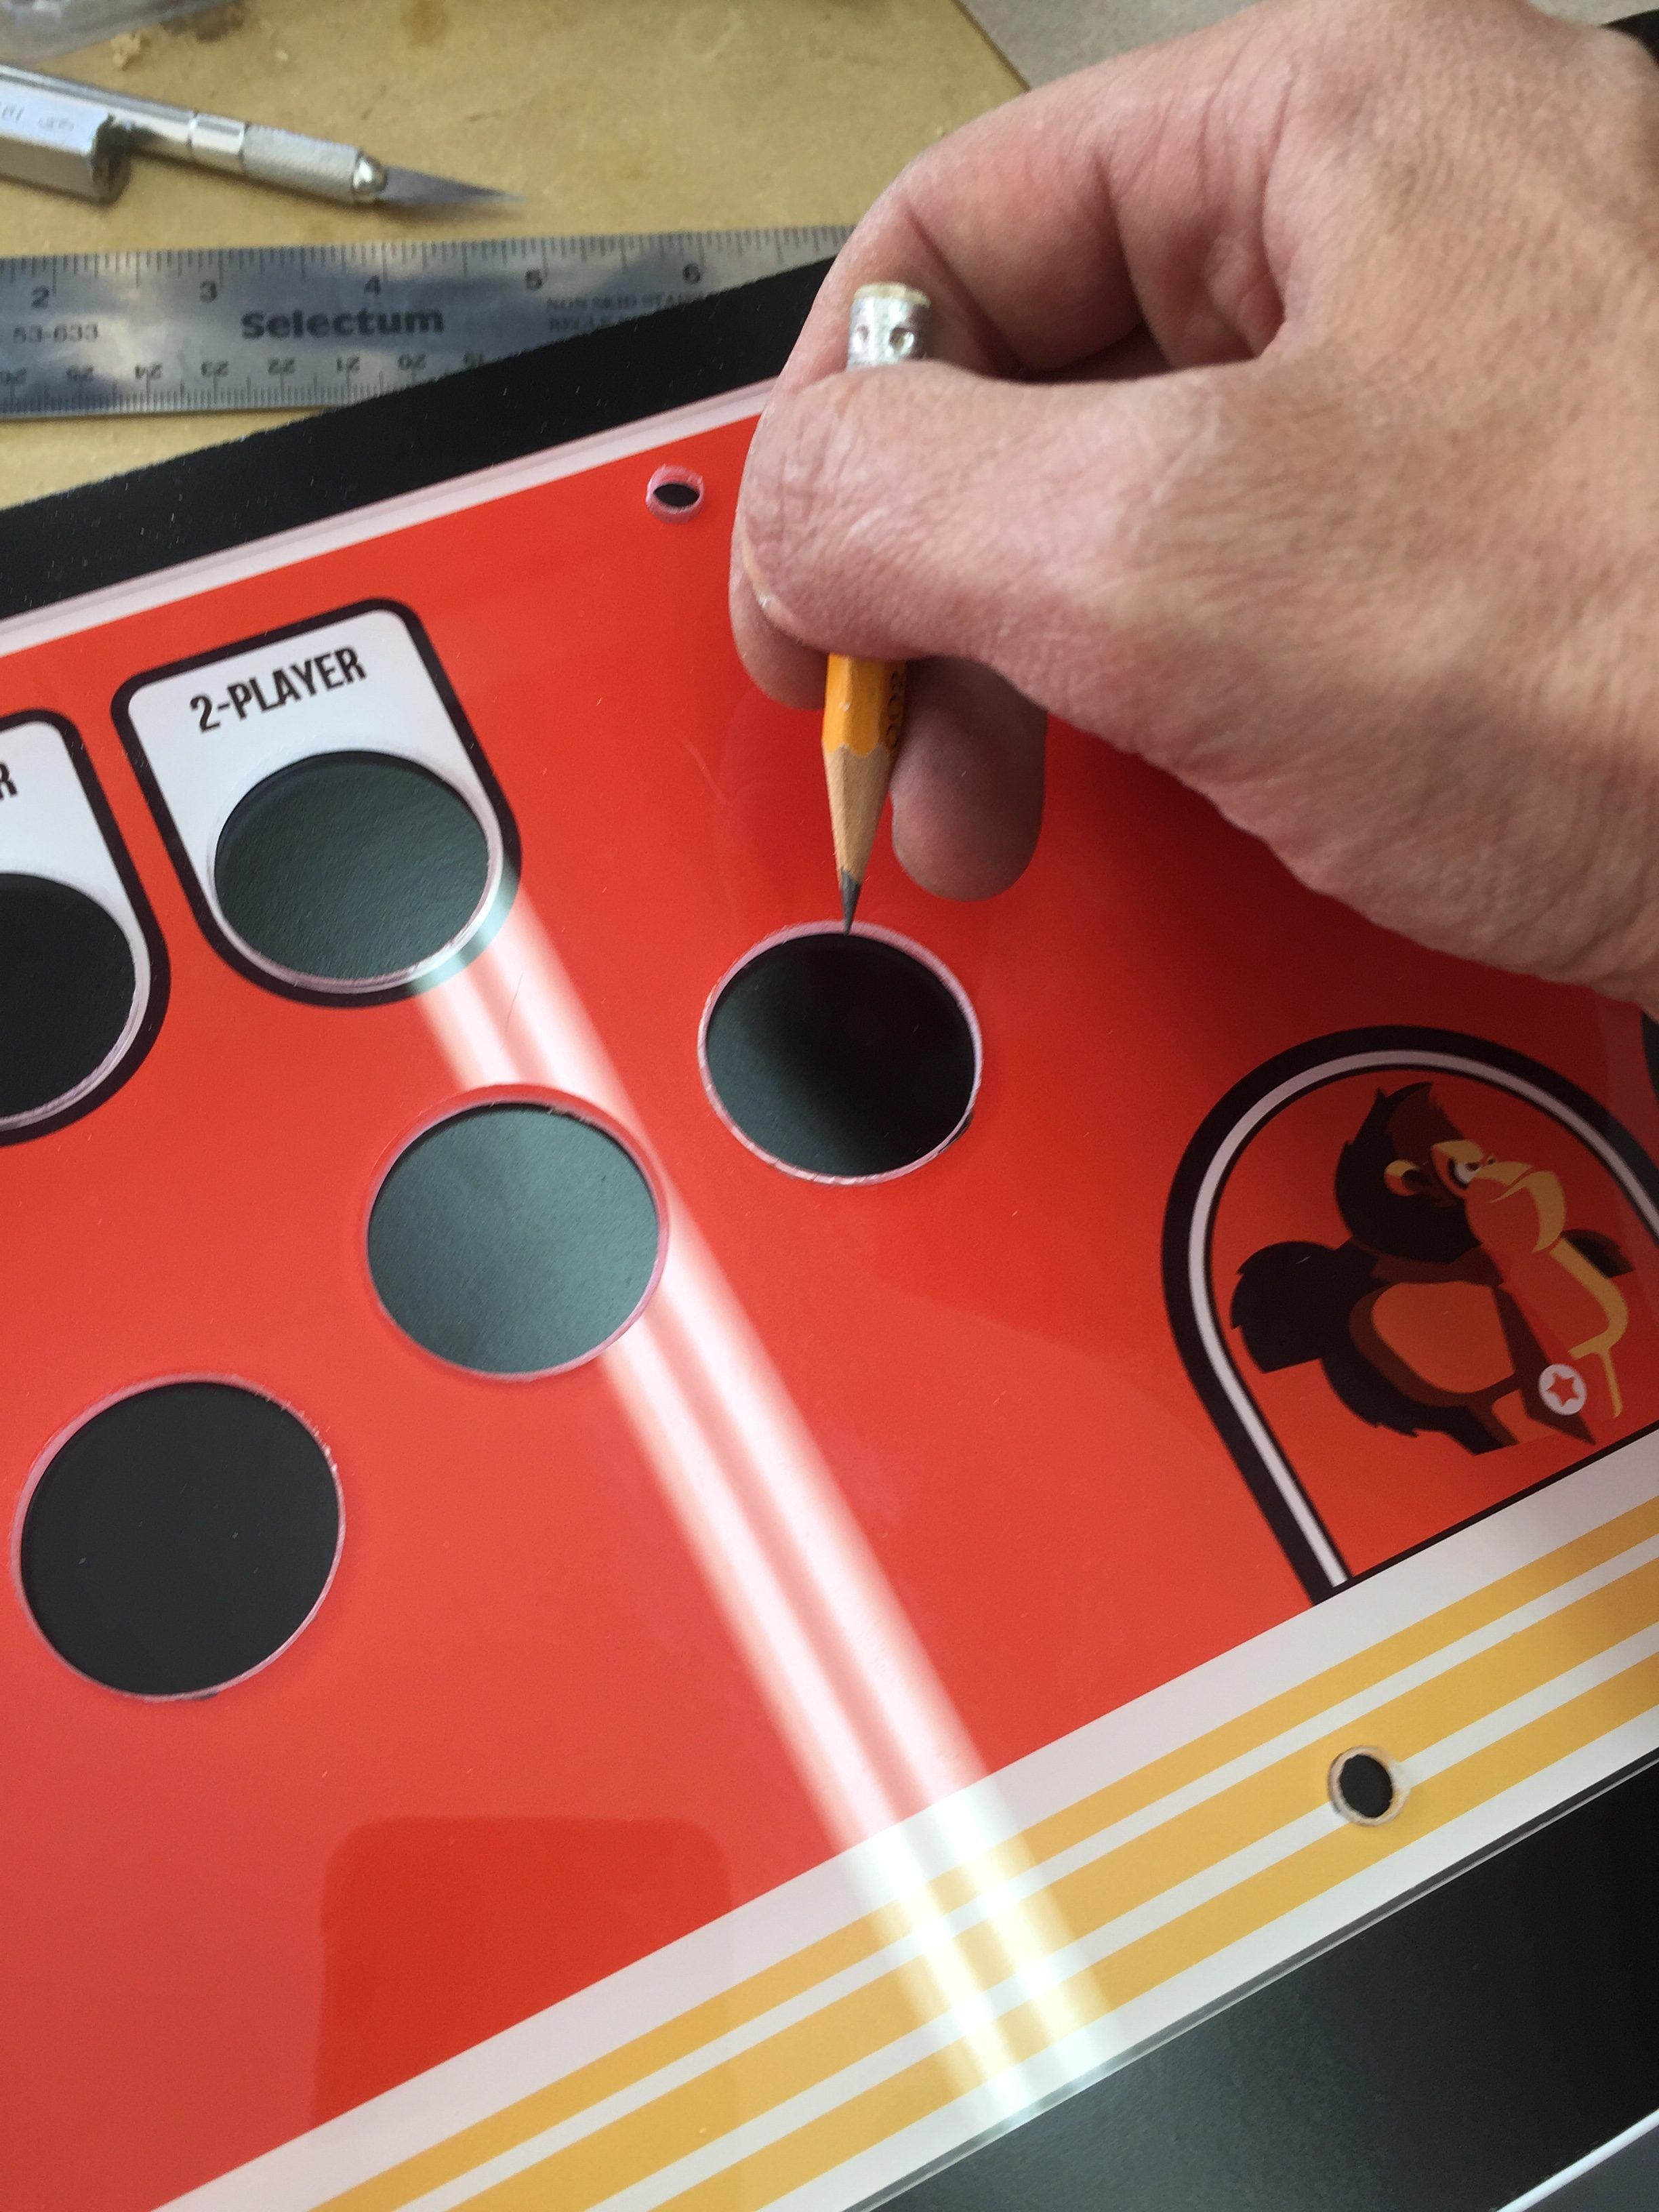 Donkey Kong Arcade Machine: Tracing Holes